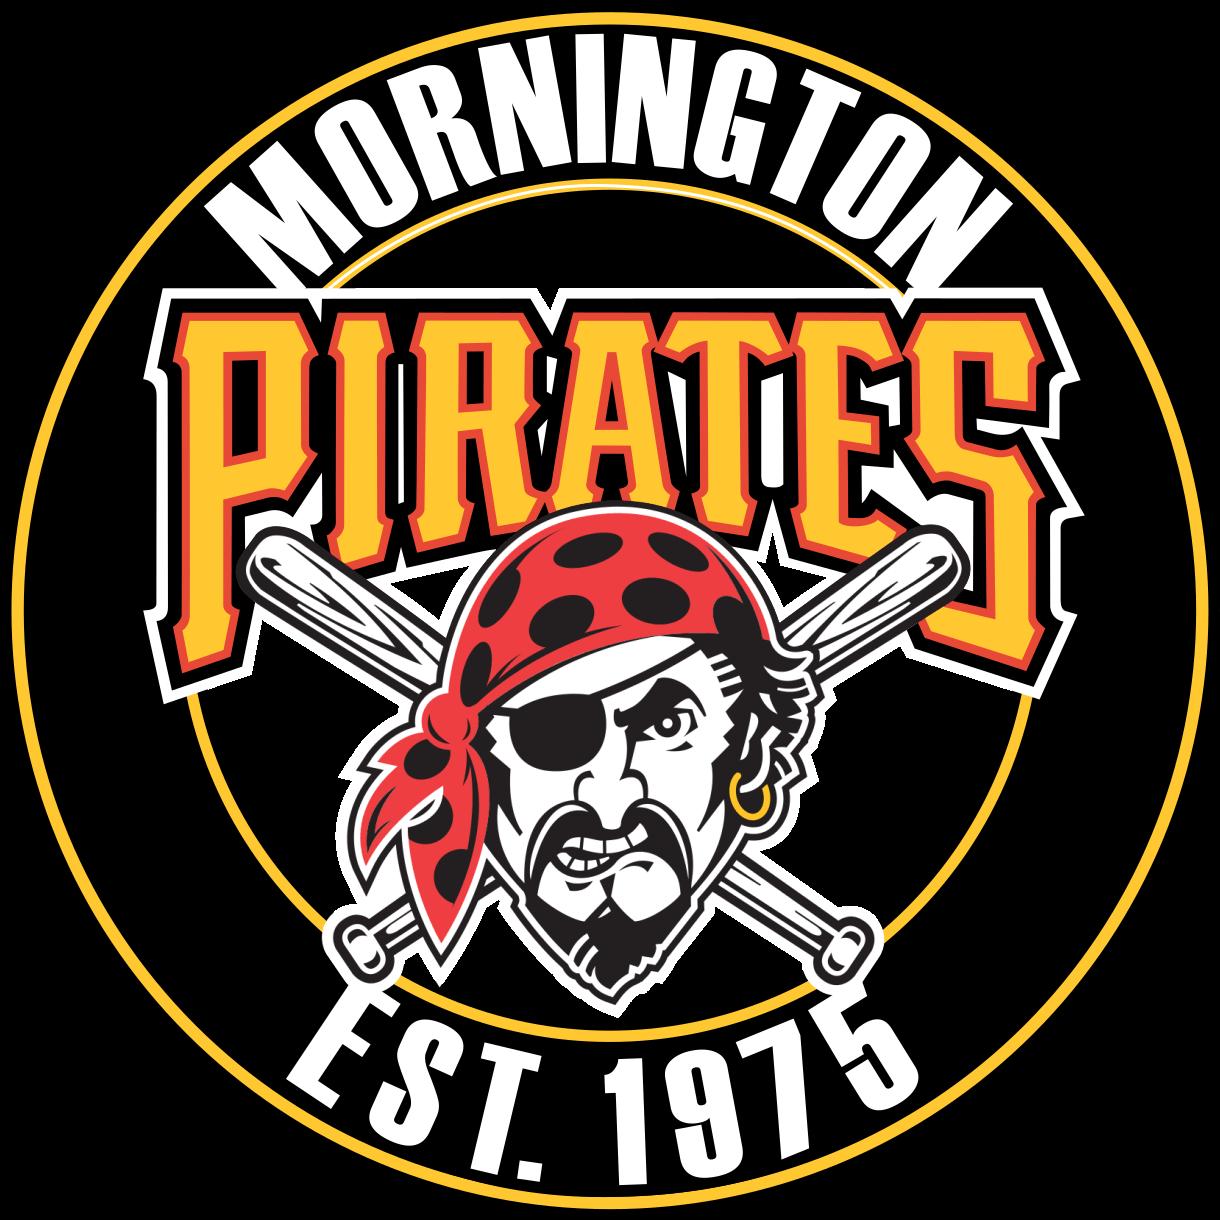 Mornington Baseball Club